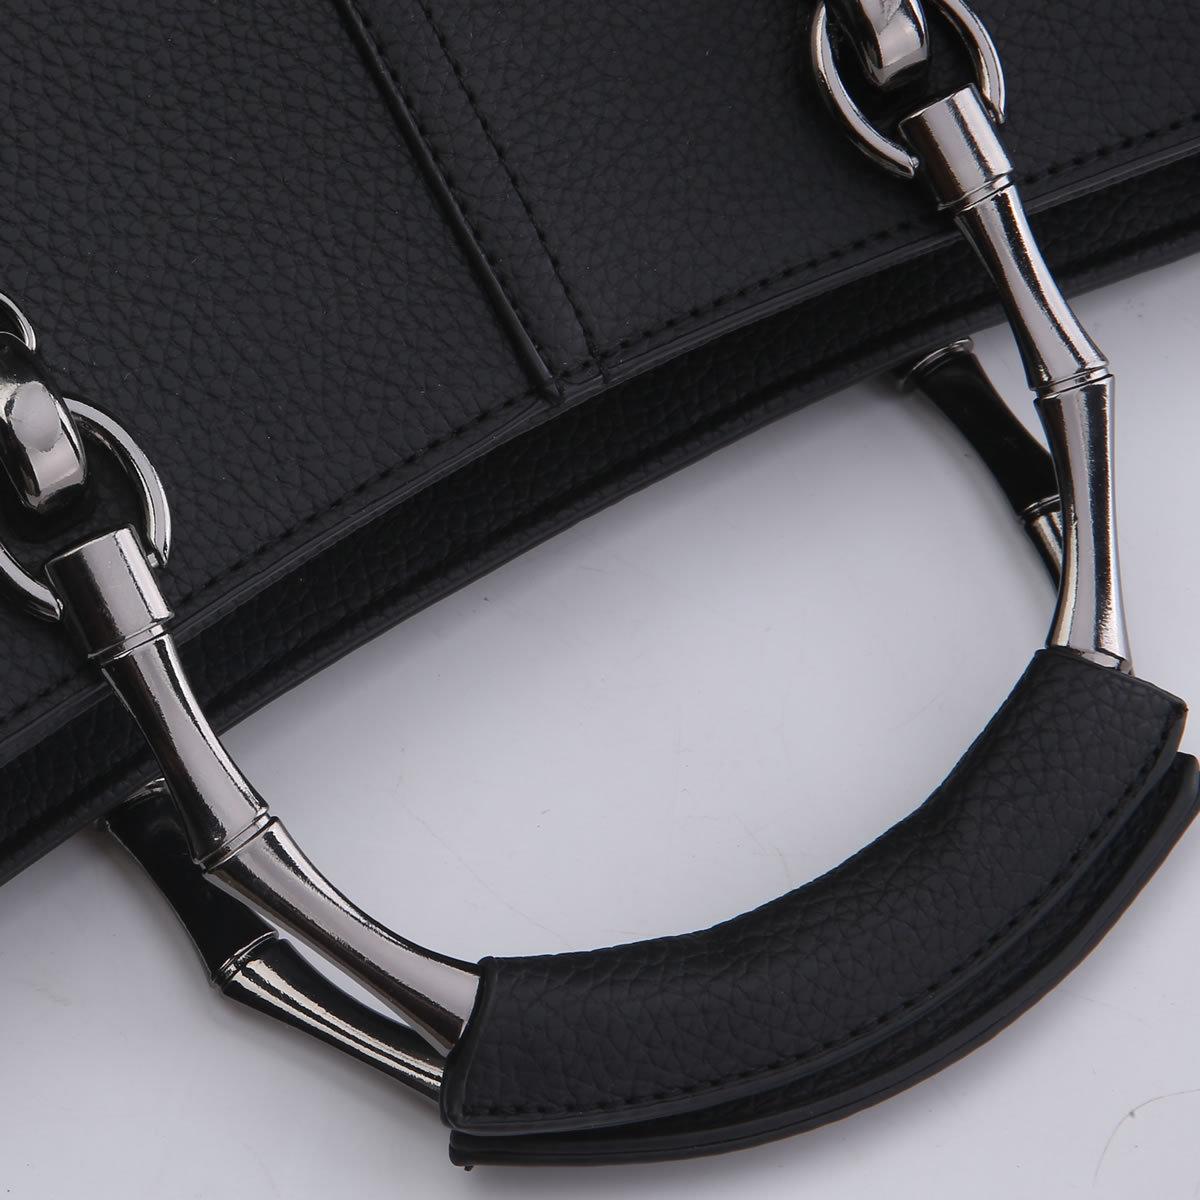 2017 New Woman Handbag Famous Brands Shoulder Bag Ladies Casual Tote Bags High Quality Luxury Handbags Women Bags Designer Bag